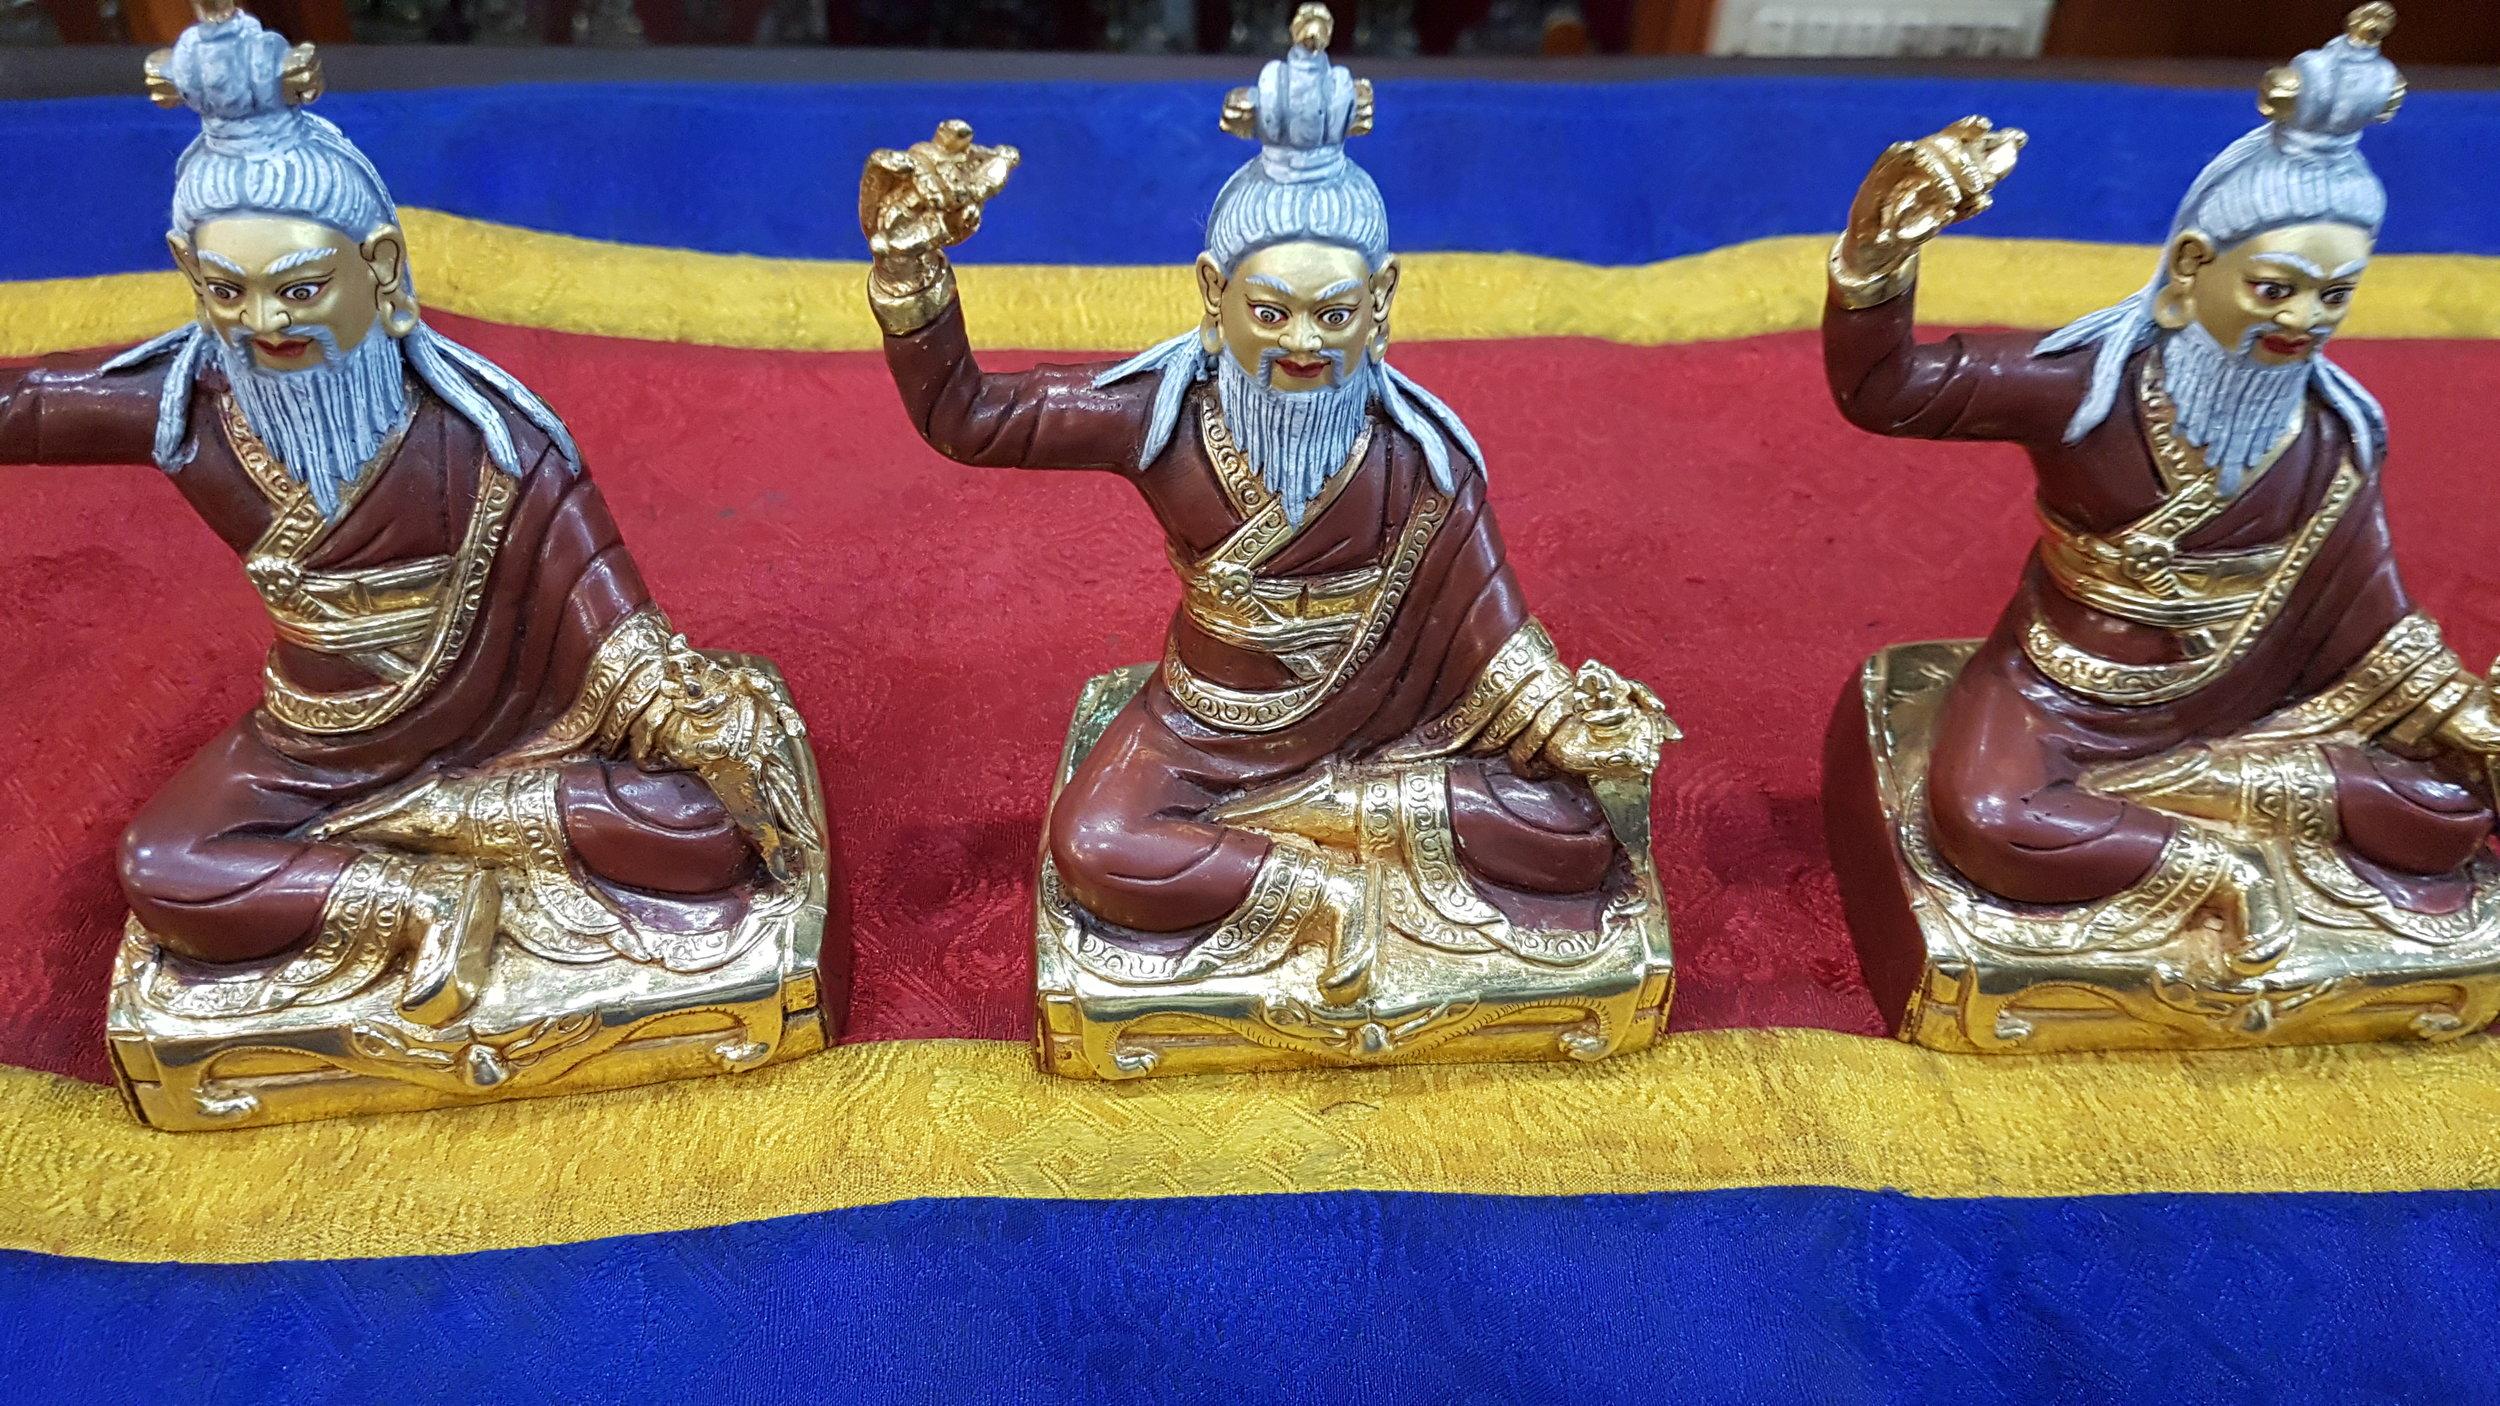 Copy of Dudjom Lingpa statues